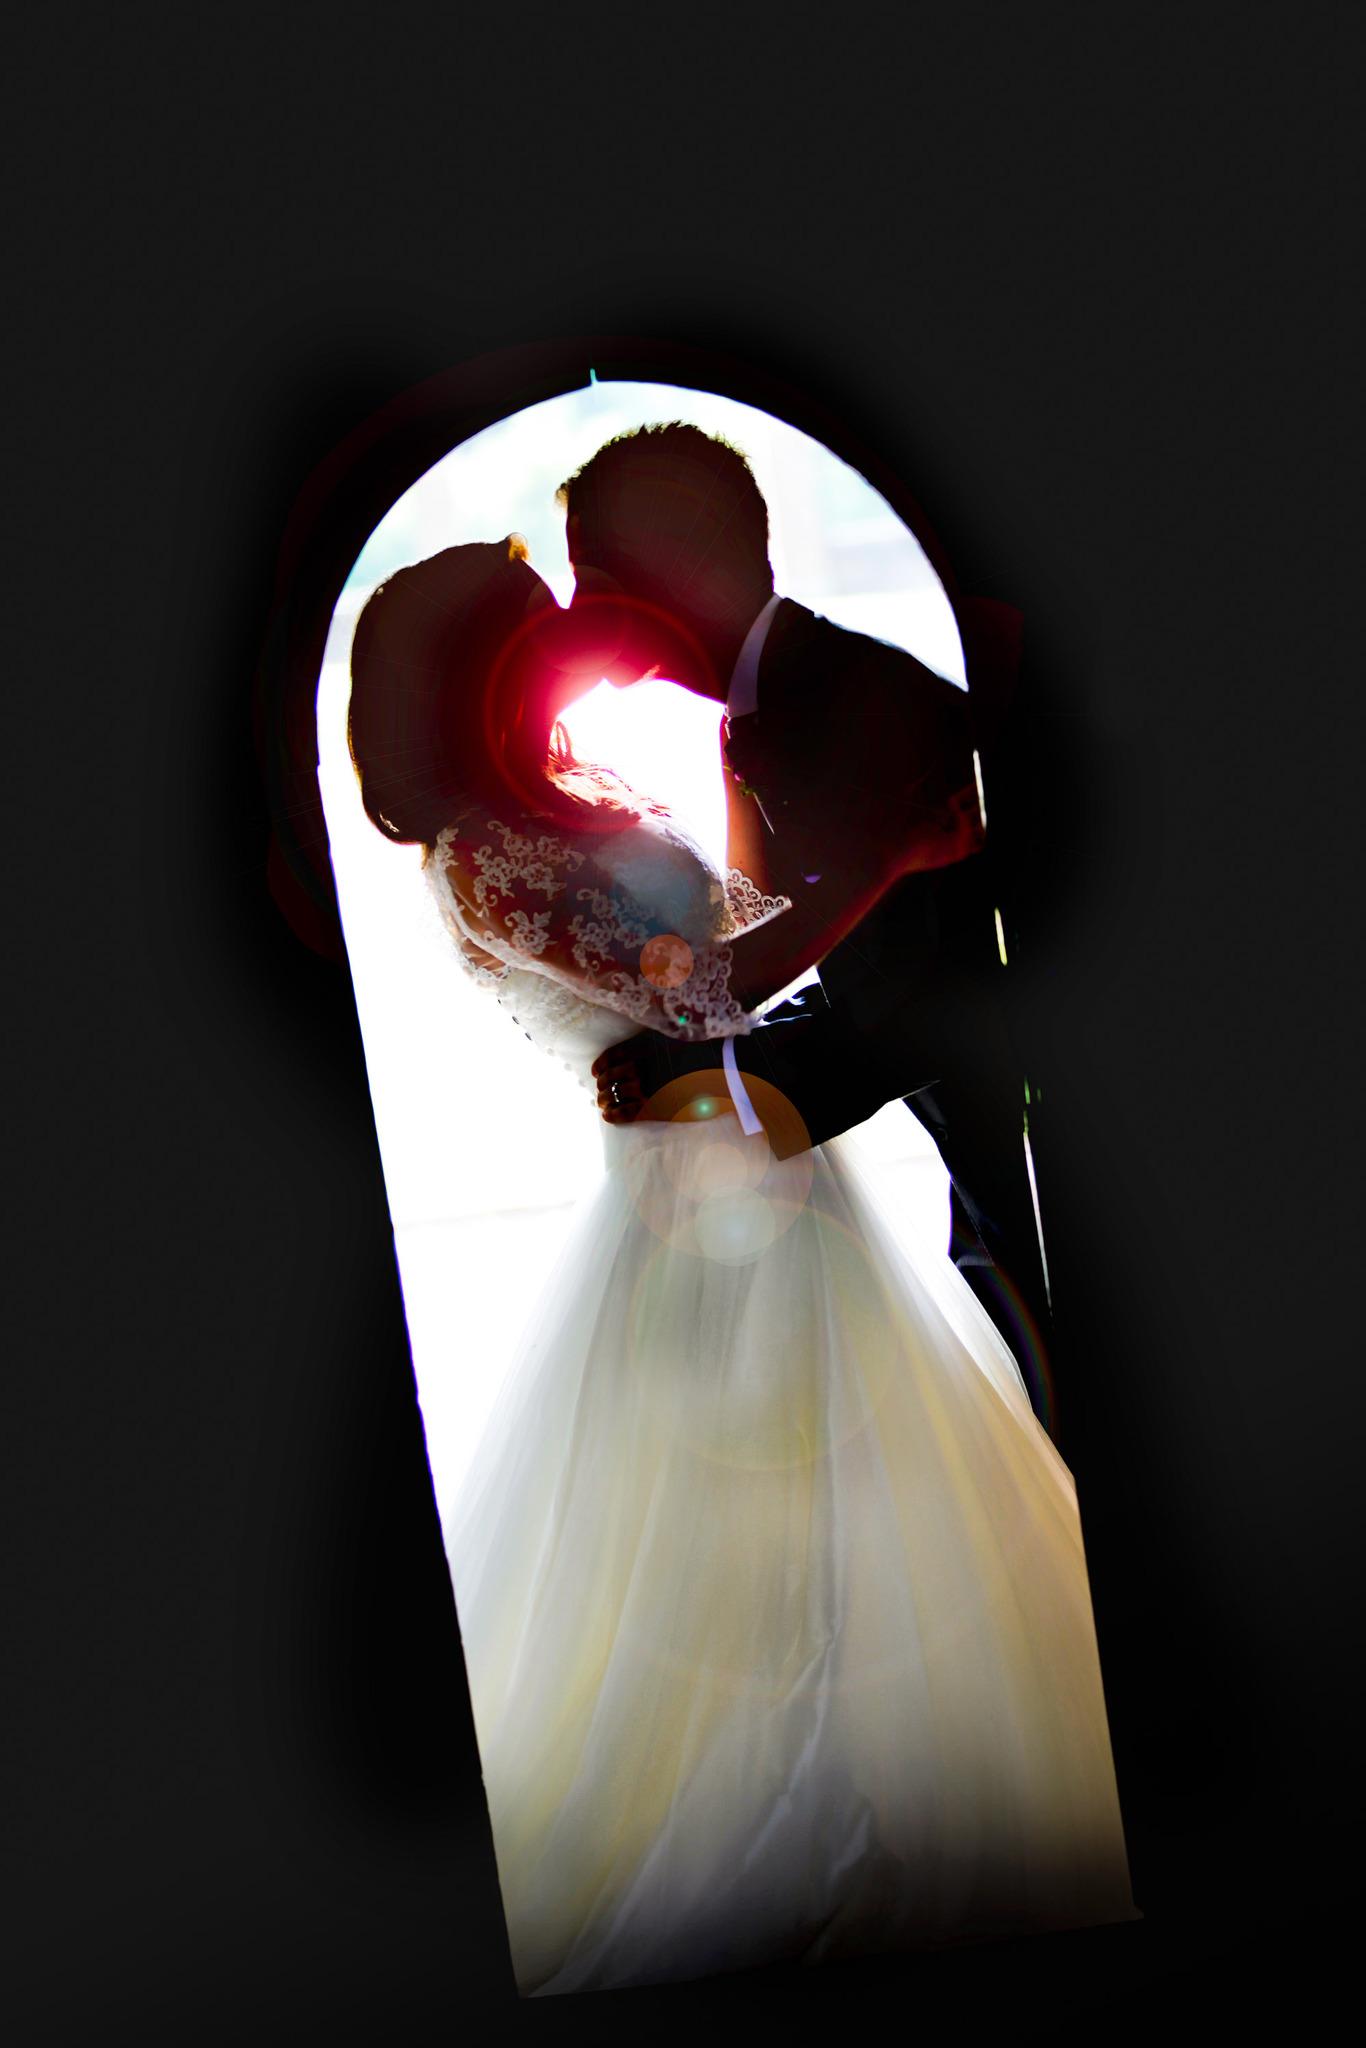 FBW_Winter_Weddings_009.jpg